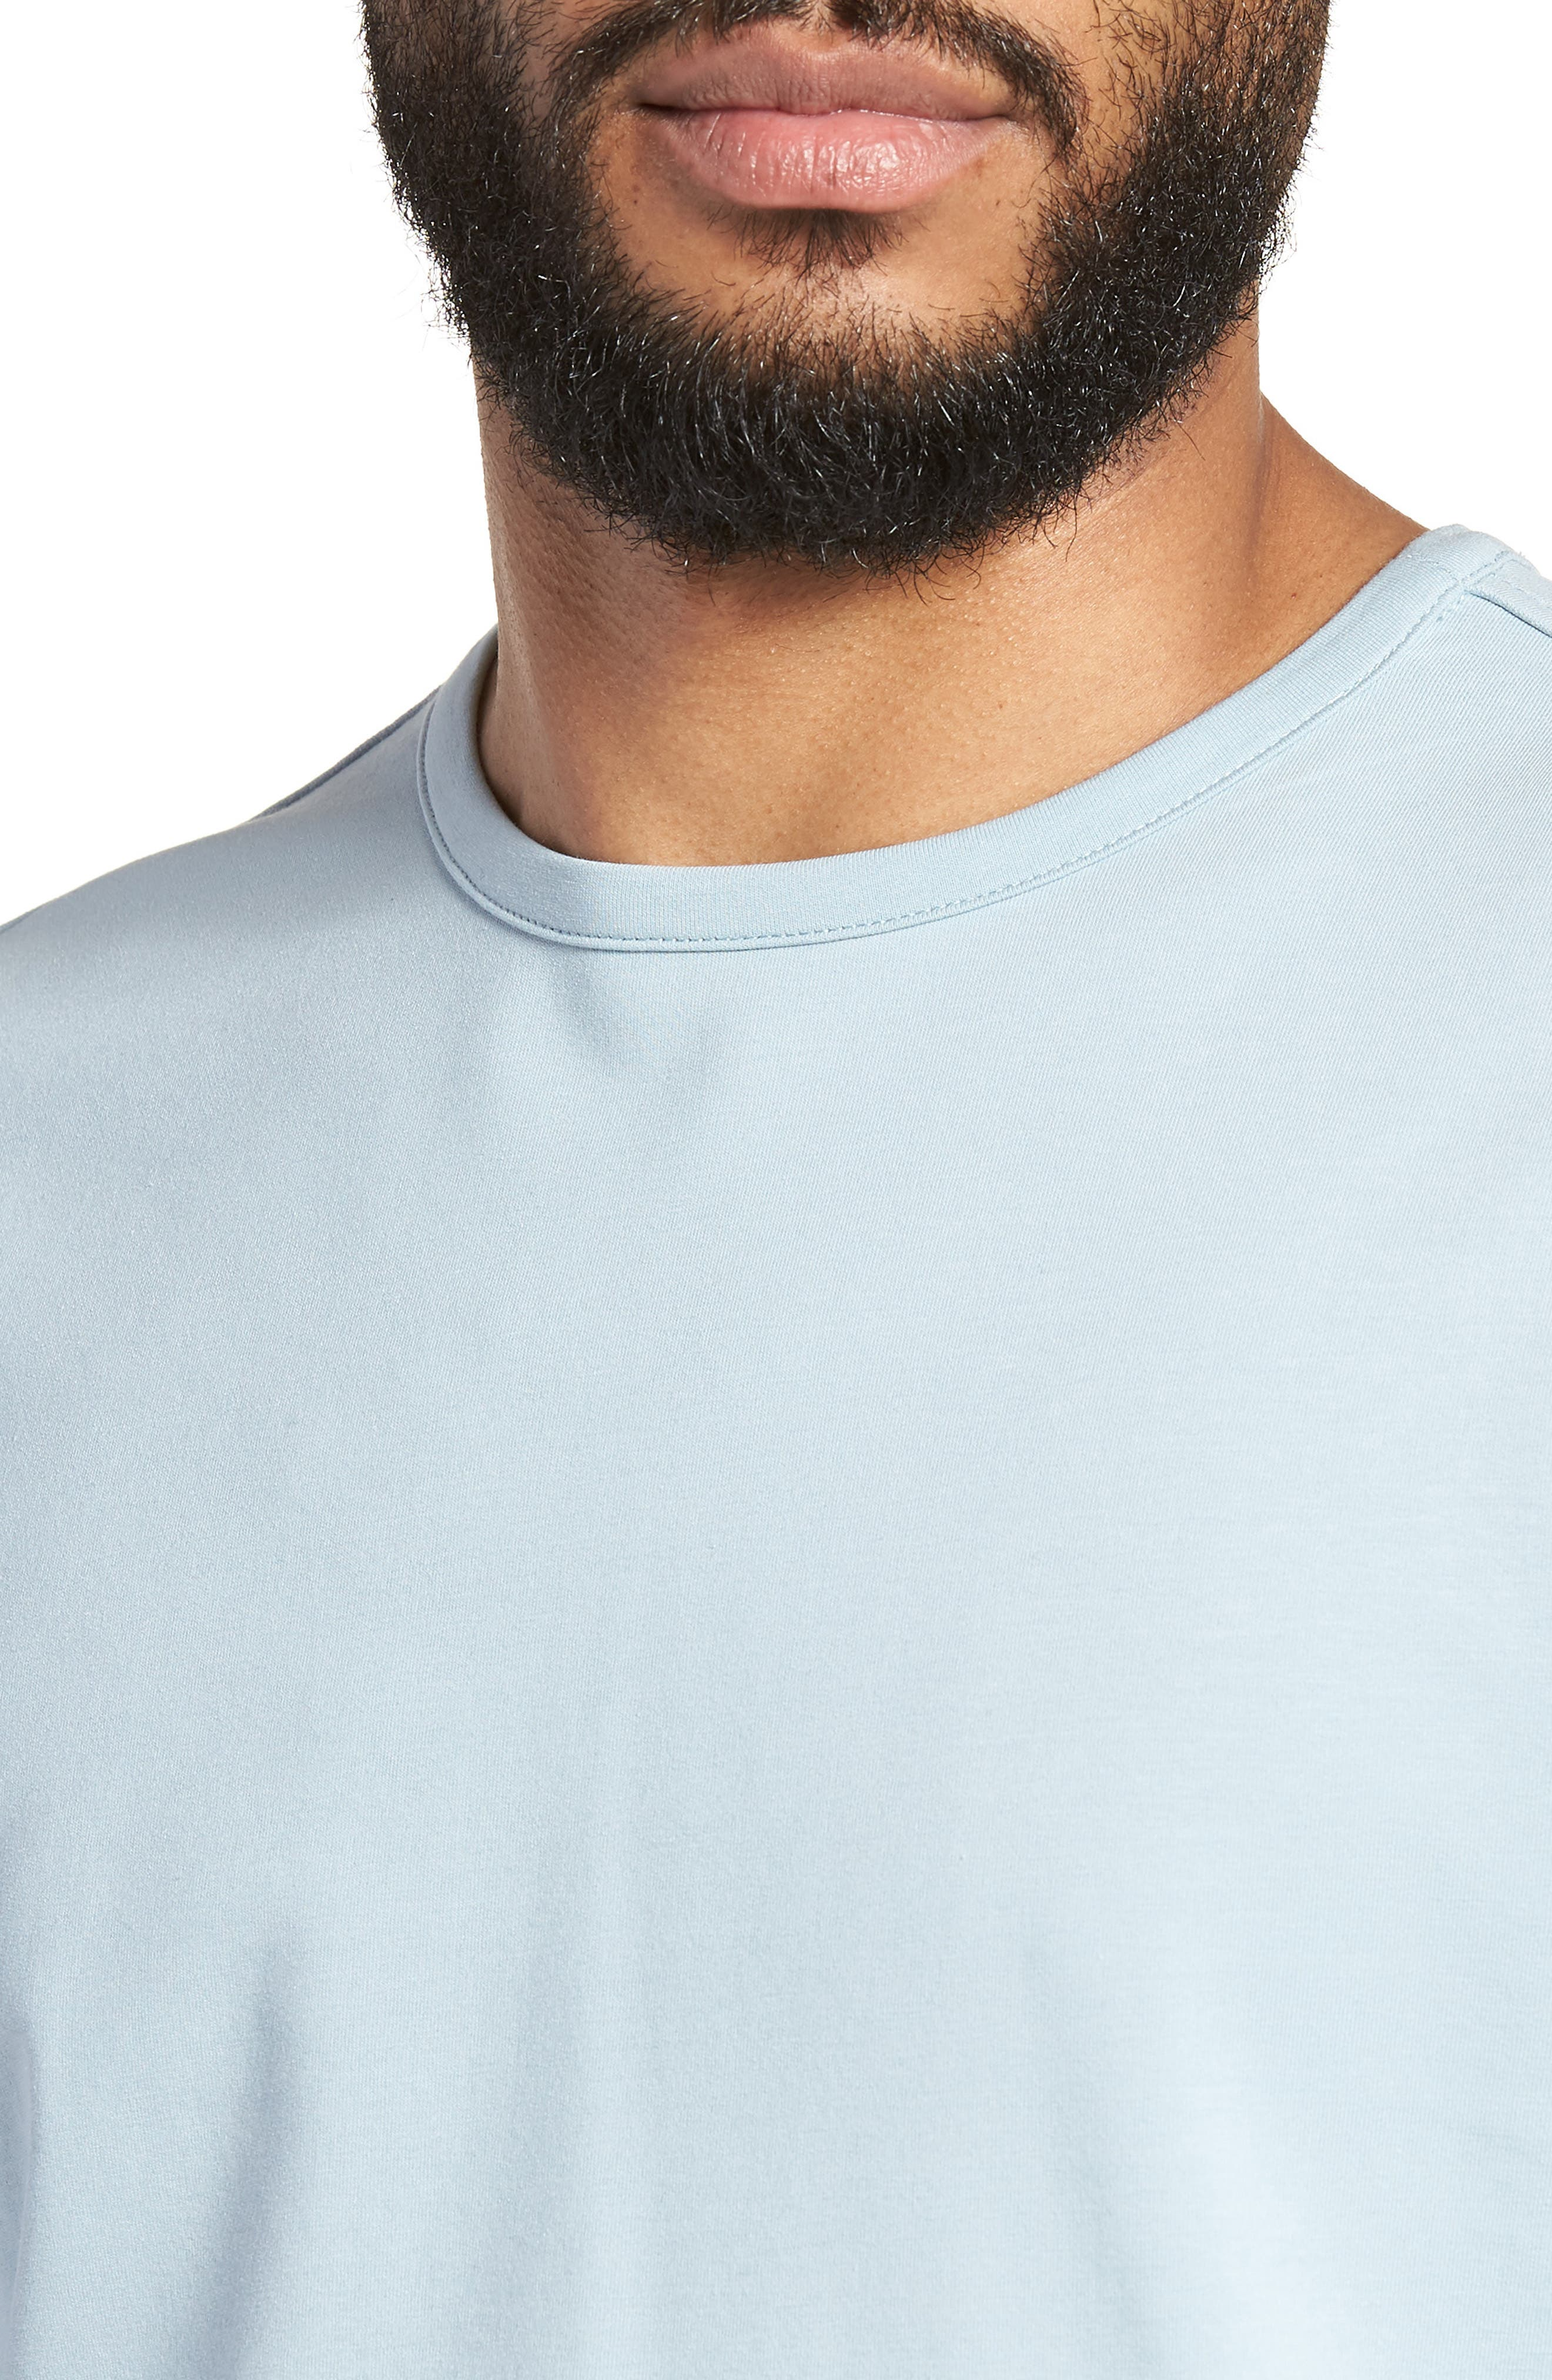 Trim Fit Long Sleeve T-Shirt,                             Alternate thumbnail 11, color,